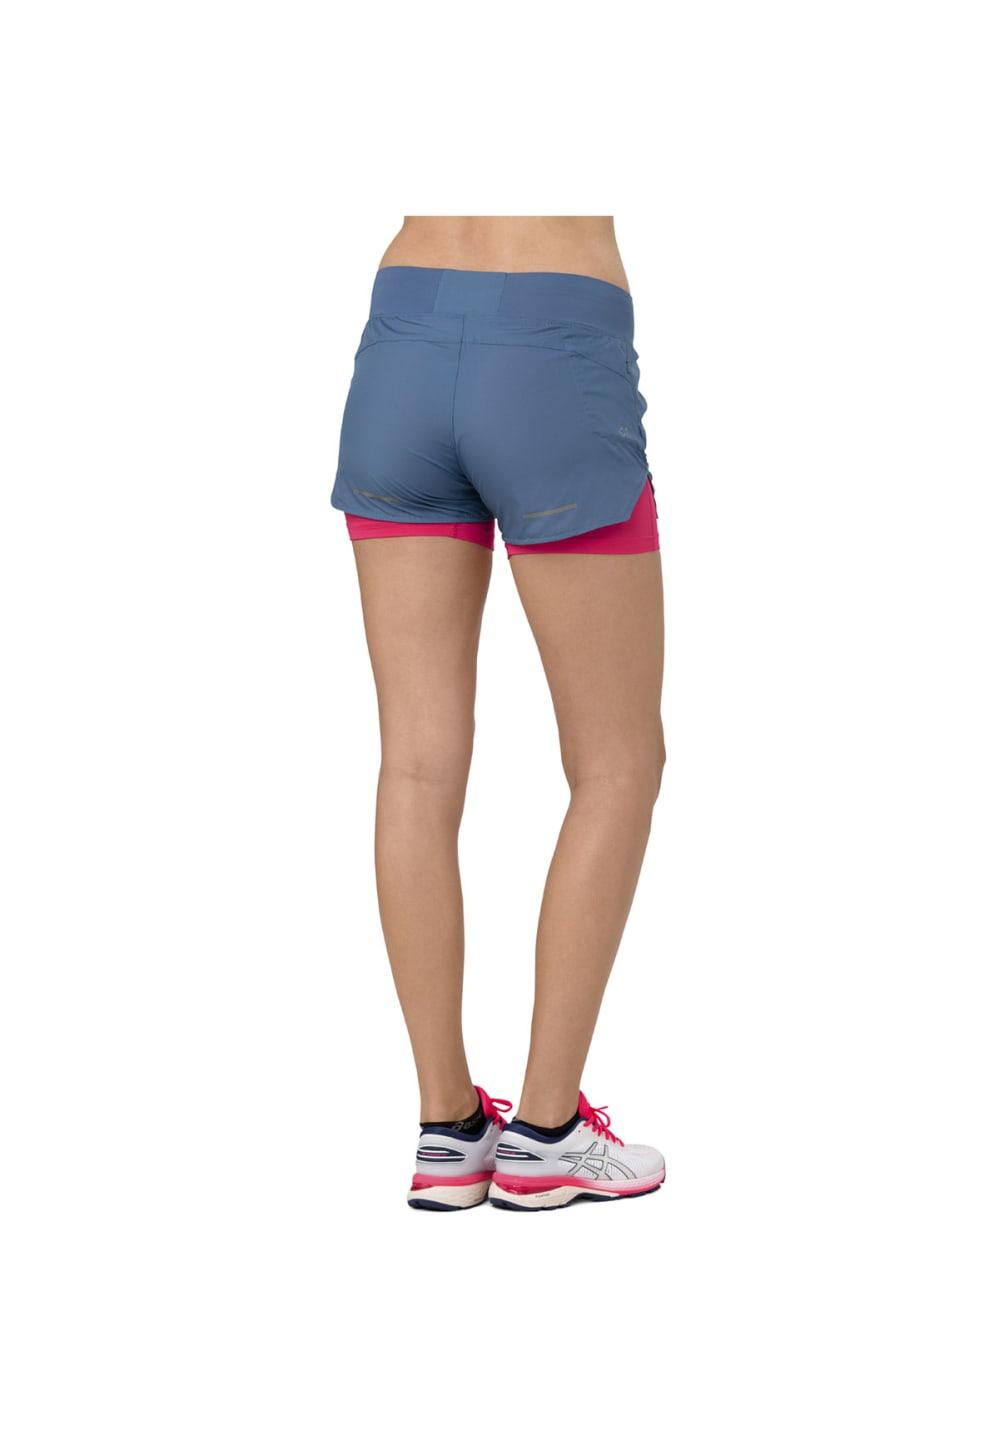 51bd65870b ASICS Cool 2-N-1 3.5In Short - Running trousers for Women - Blue